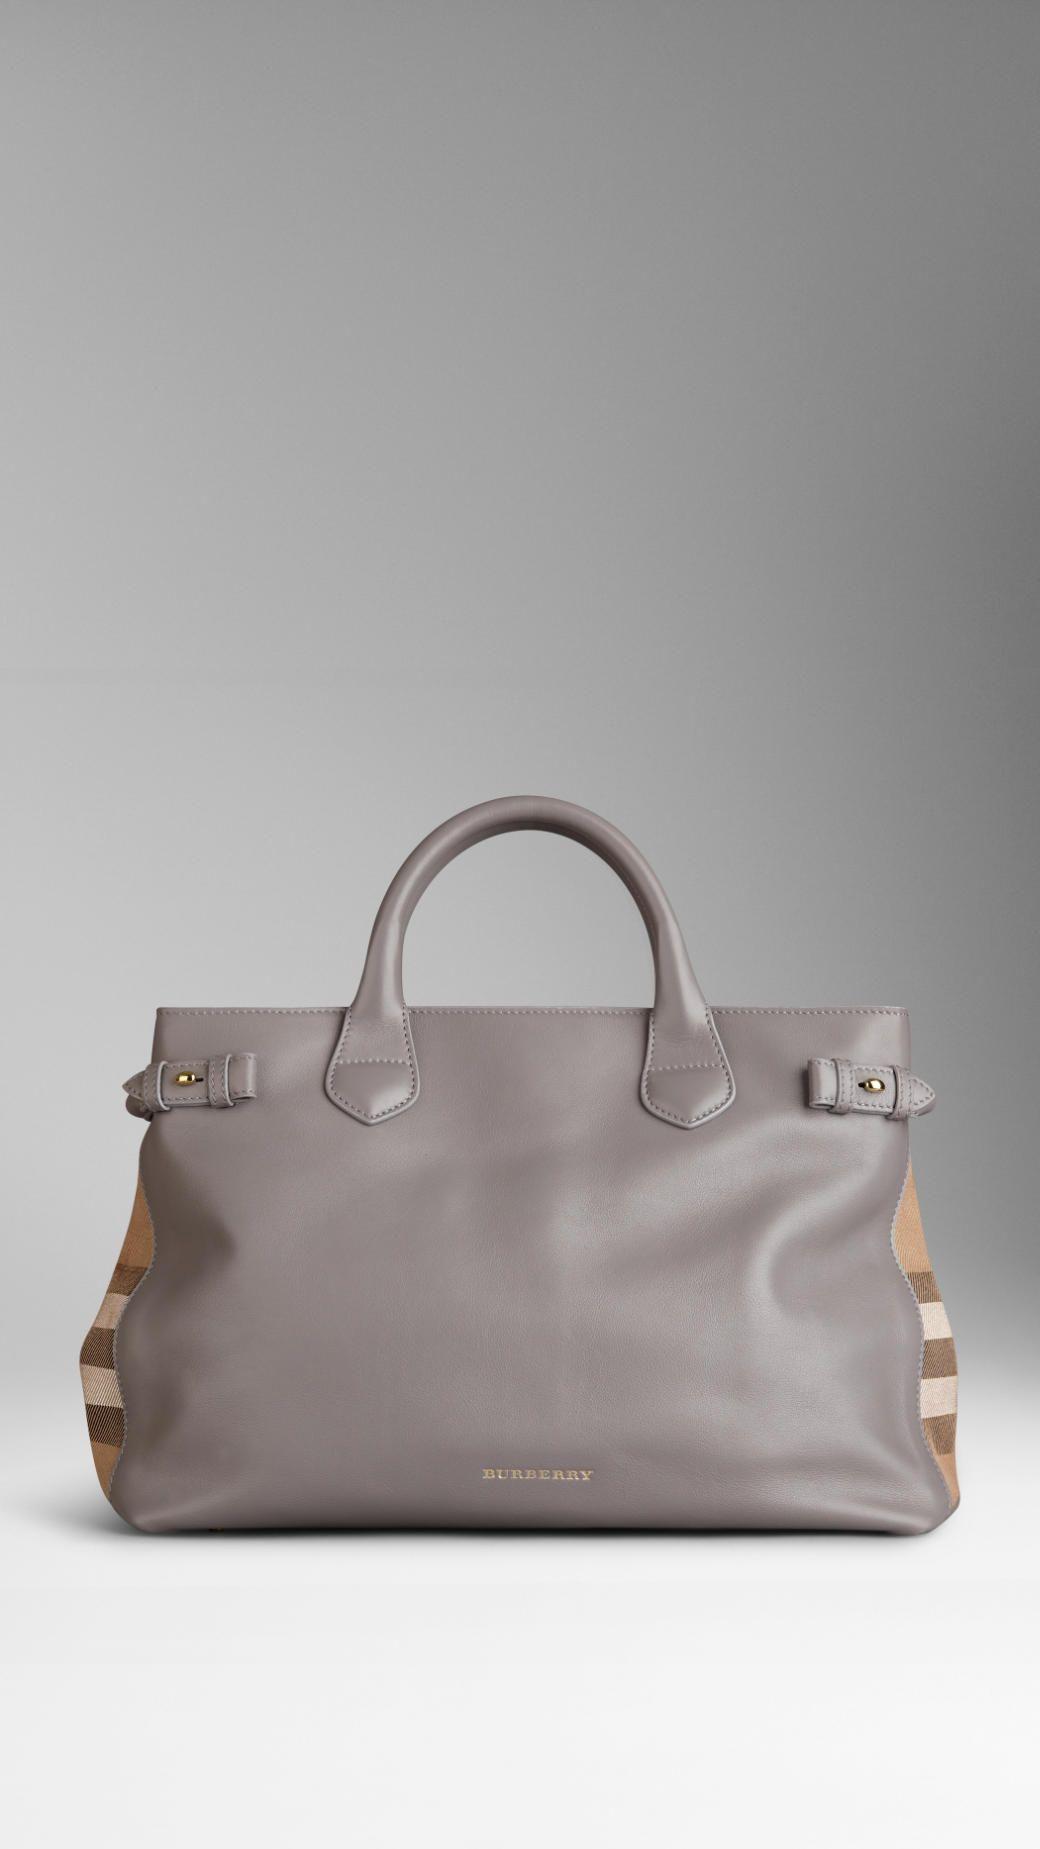 01c2d497248d Burberry Medium House Check Detail Leather Tote Bag